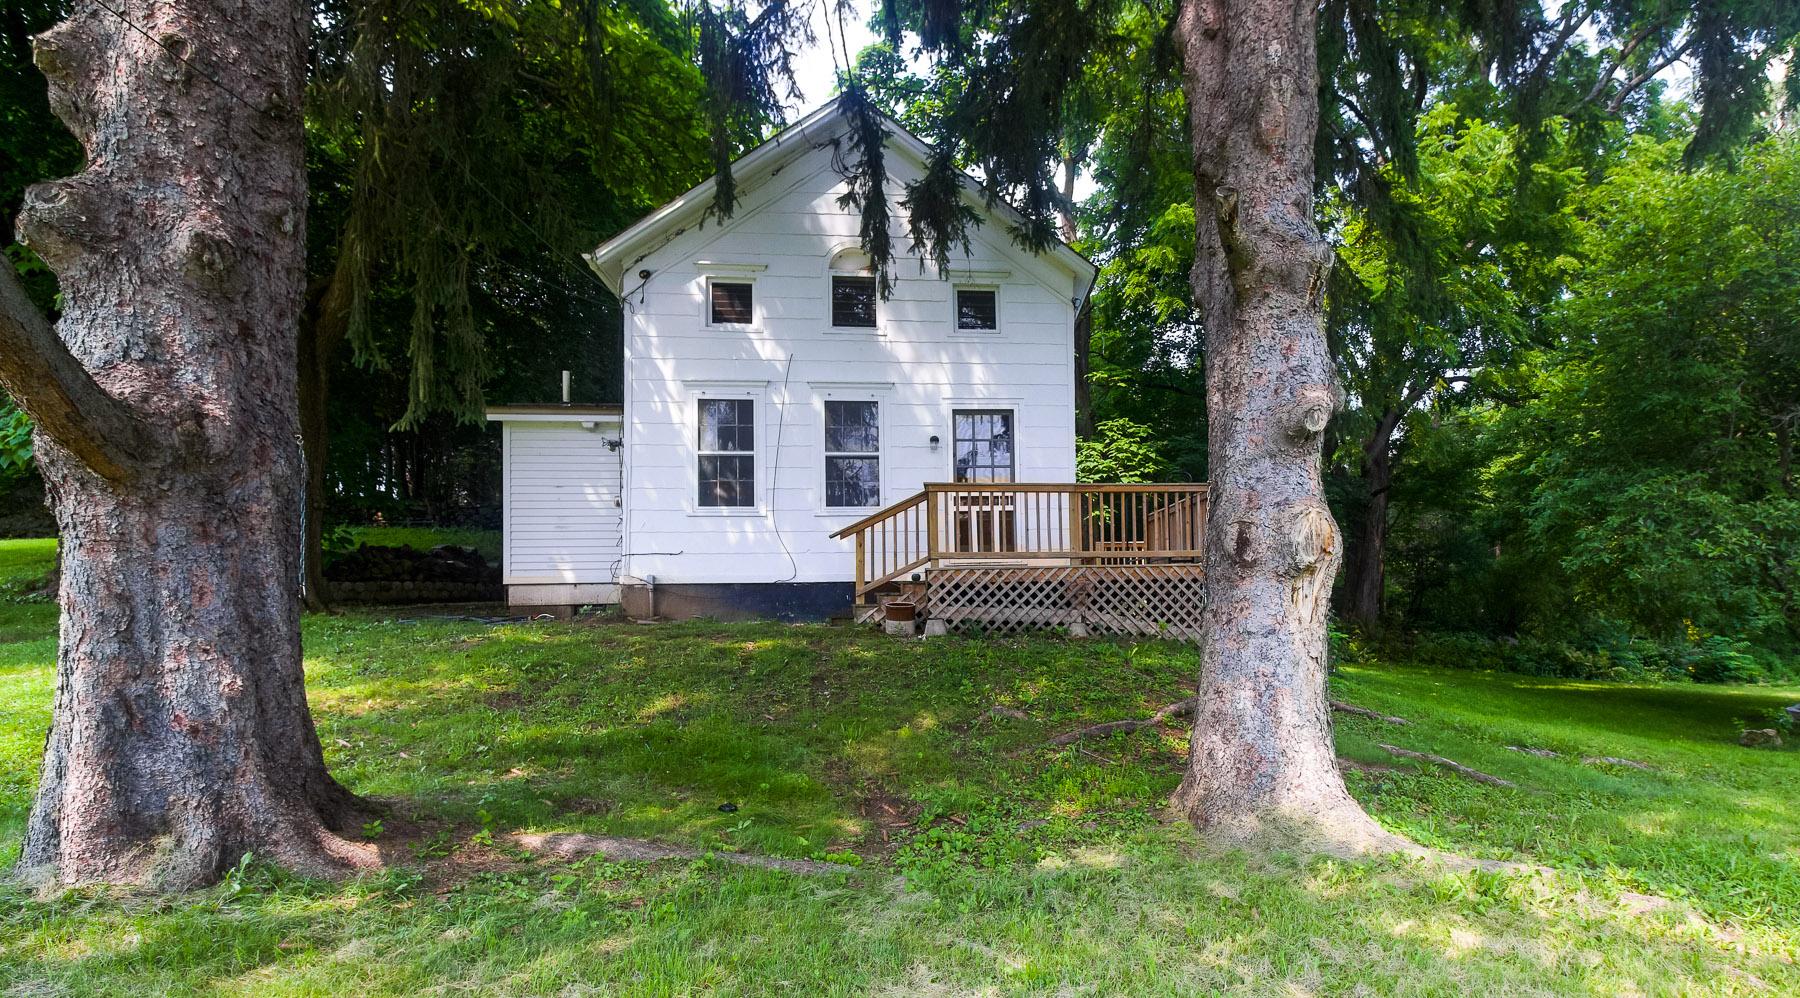 1865 Cottage